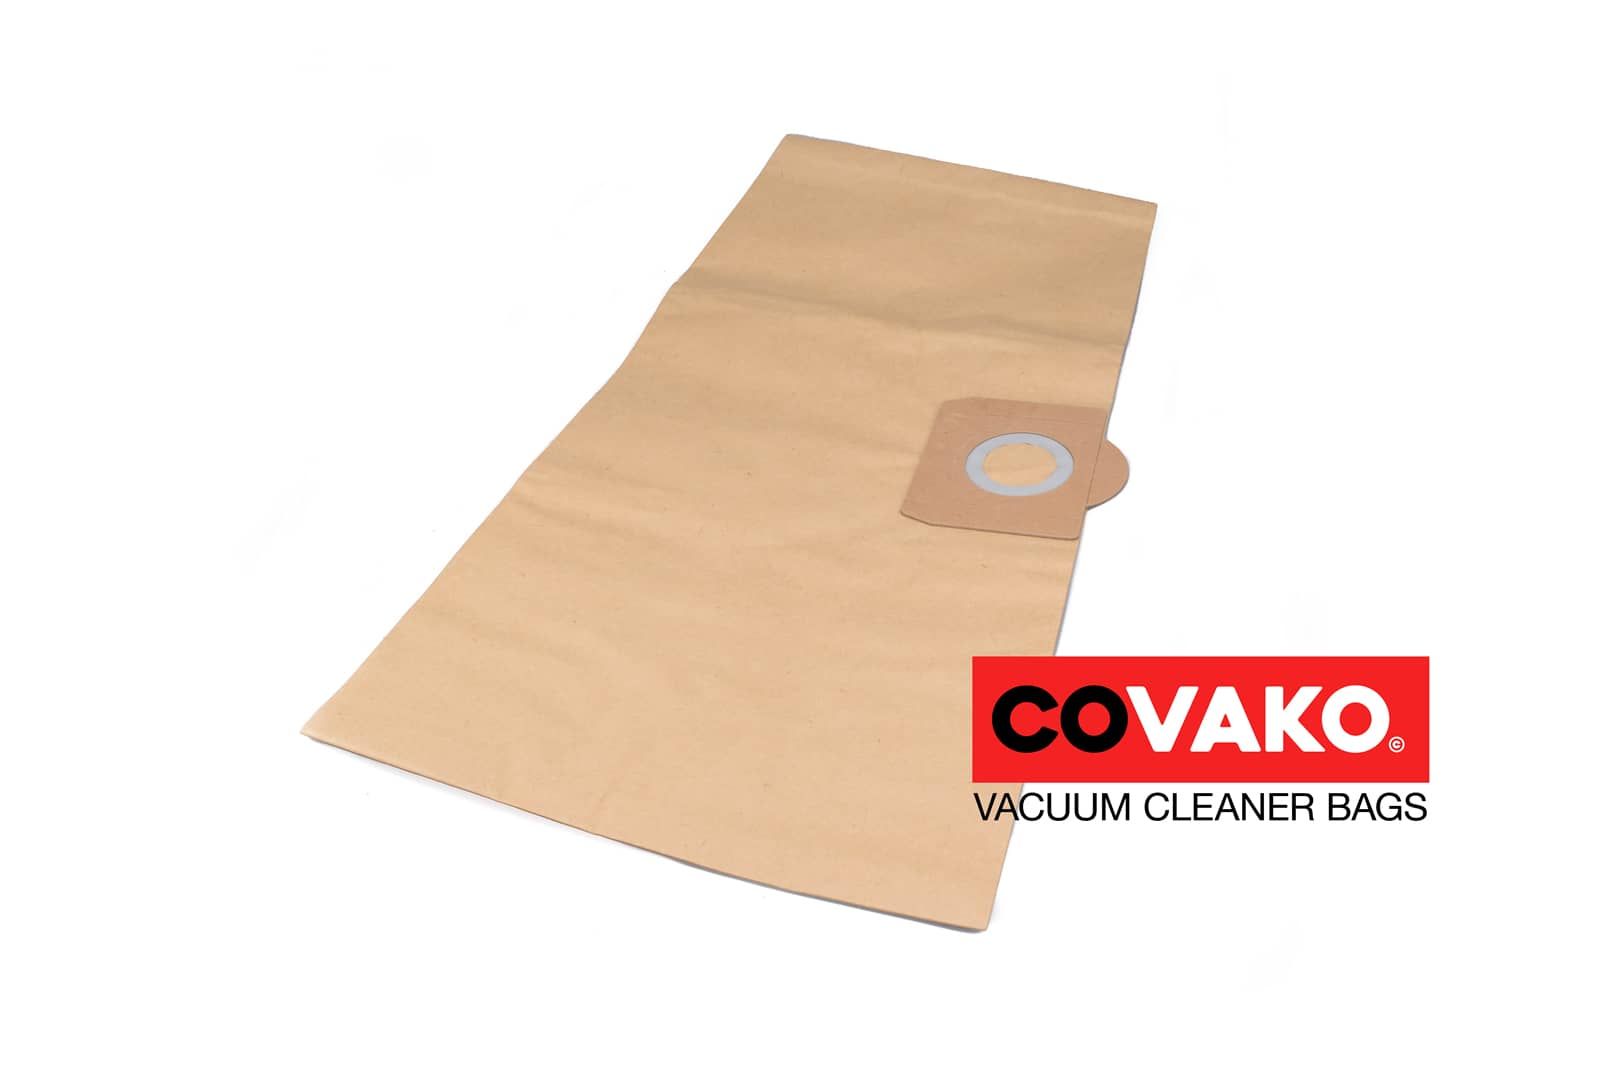 Kärcher NT 301 / Paper - Kärcher vacuum cleaner bags